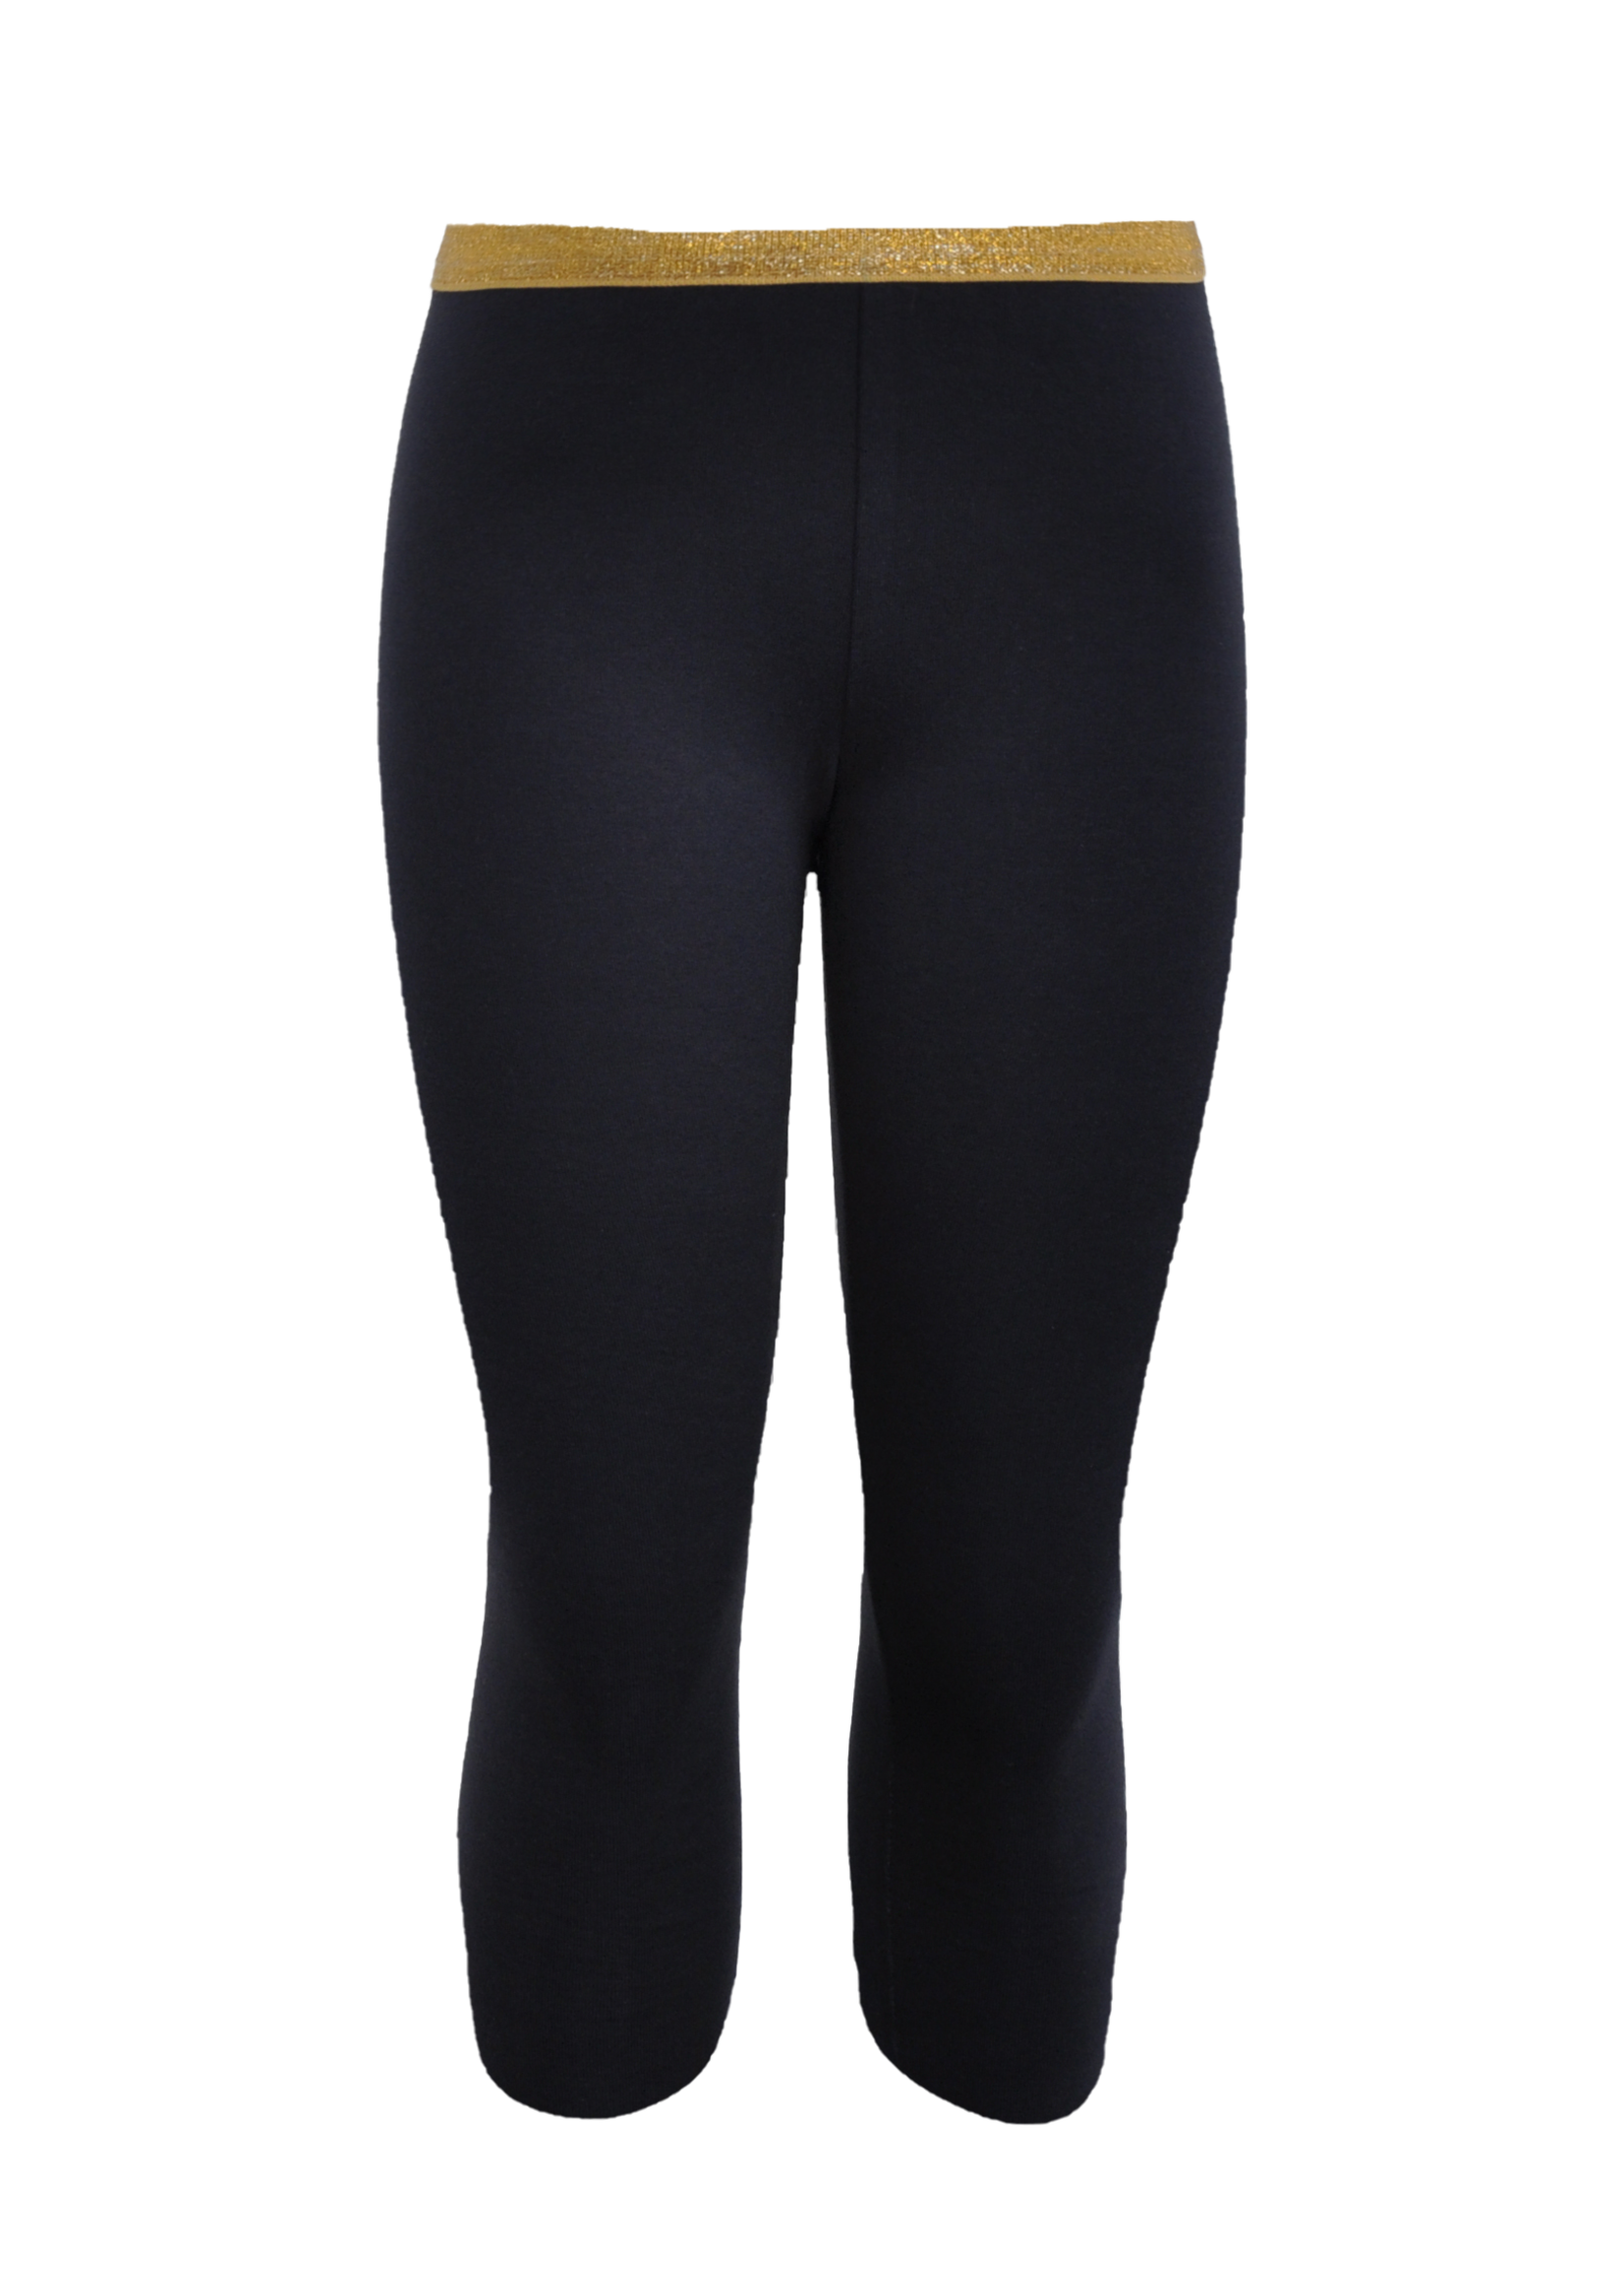 LoFff LoFff legging 3/4 length dark blue